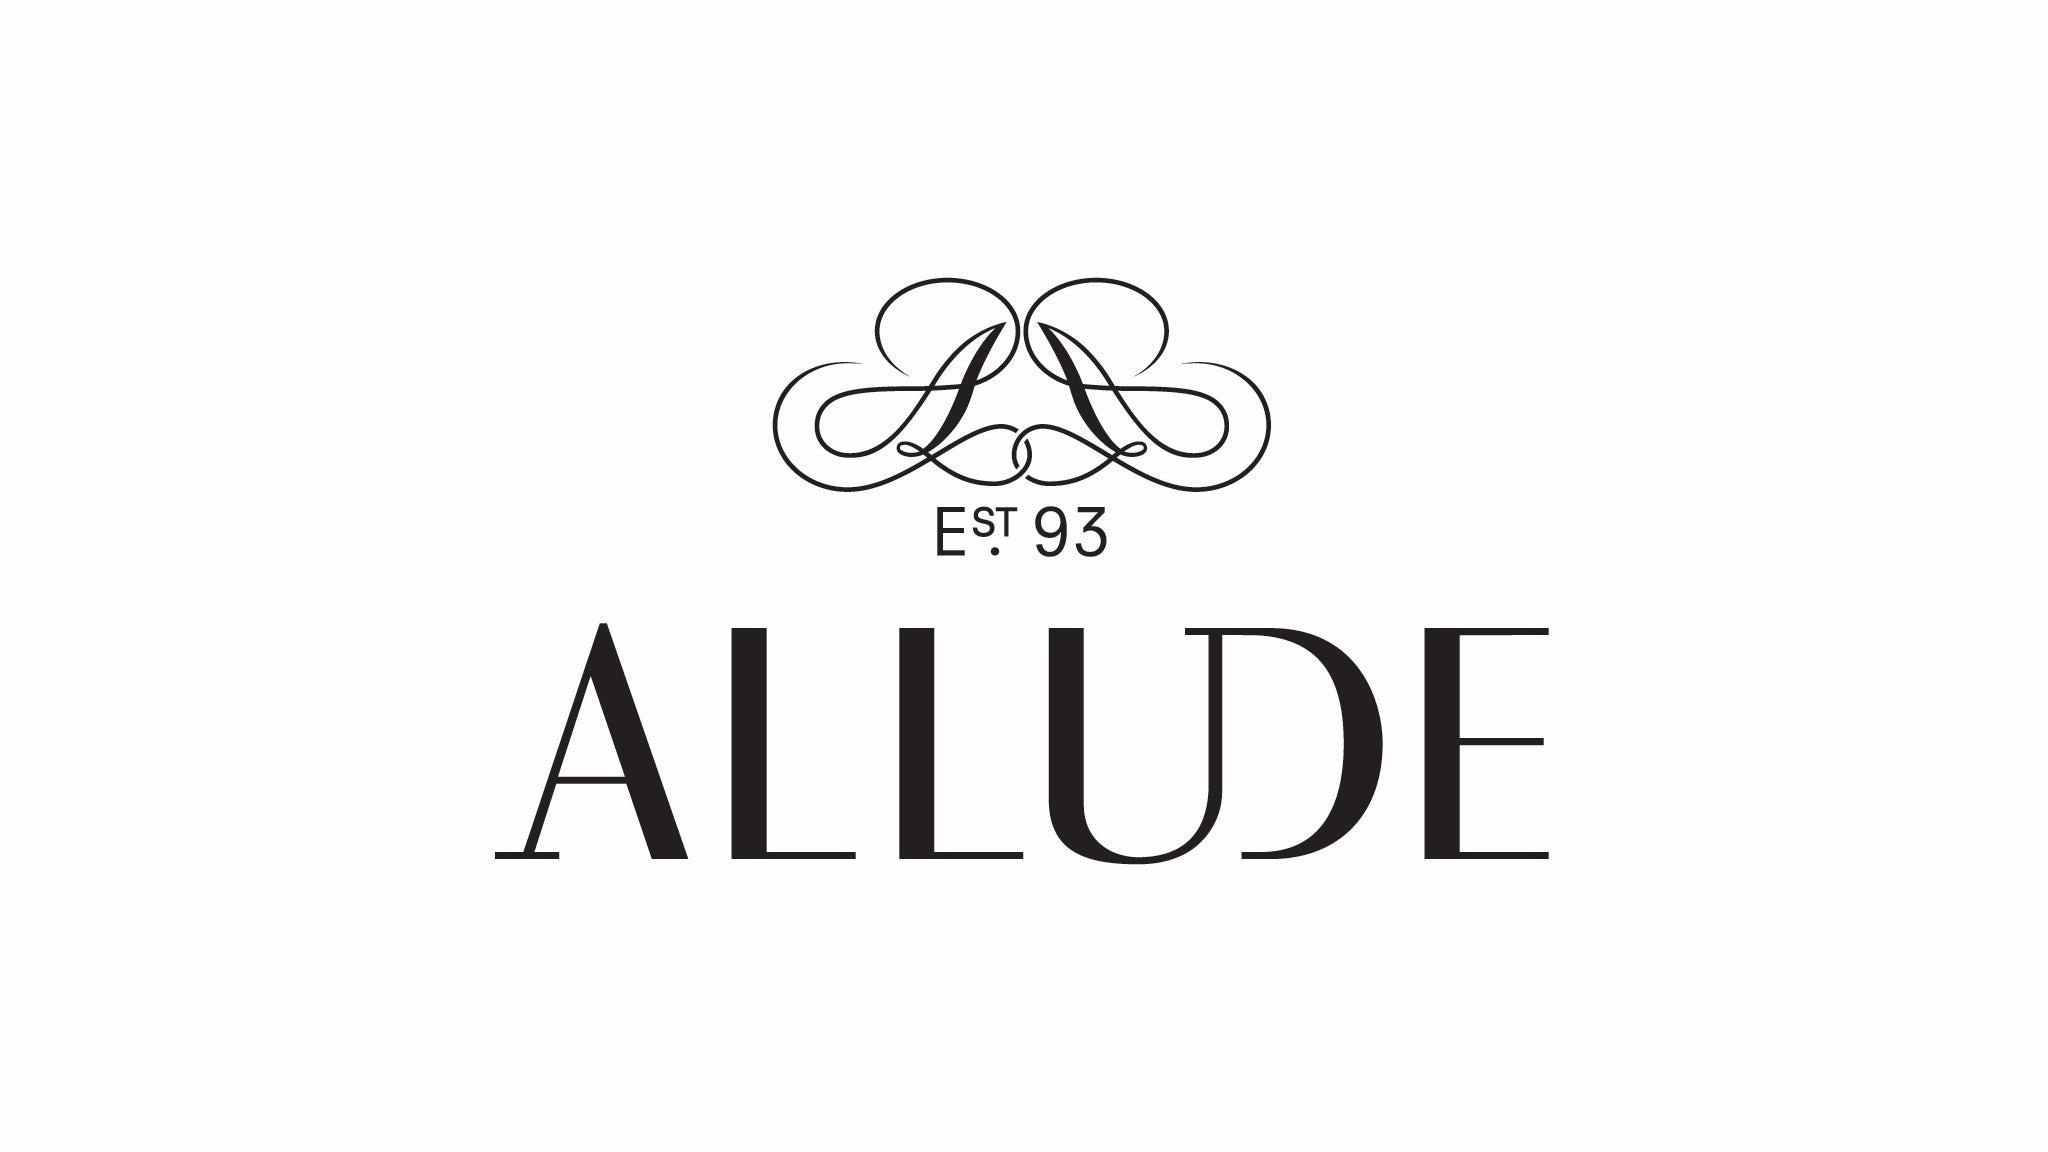 Allude company logo